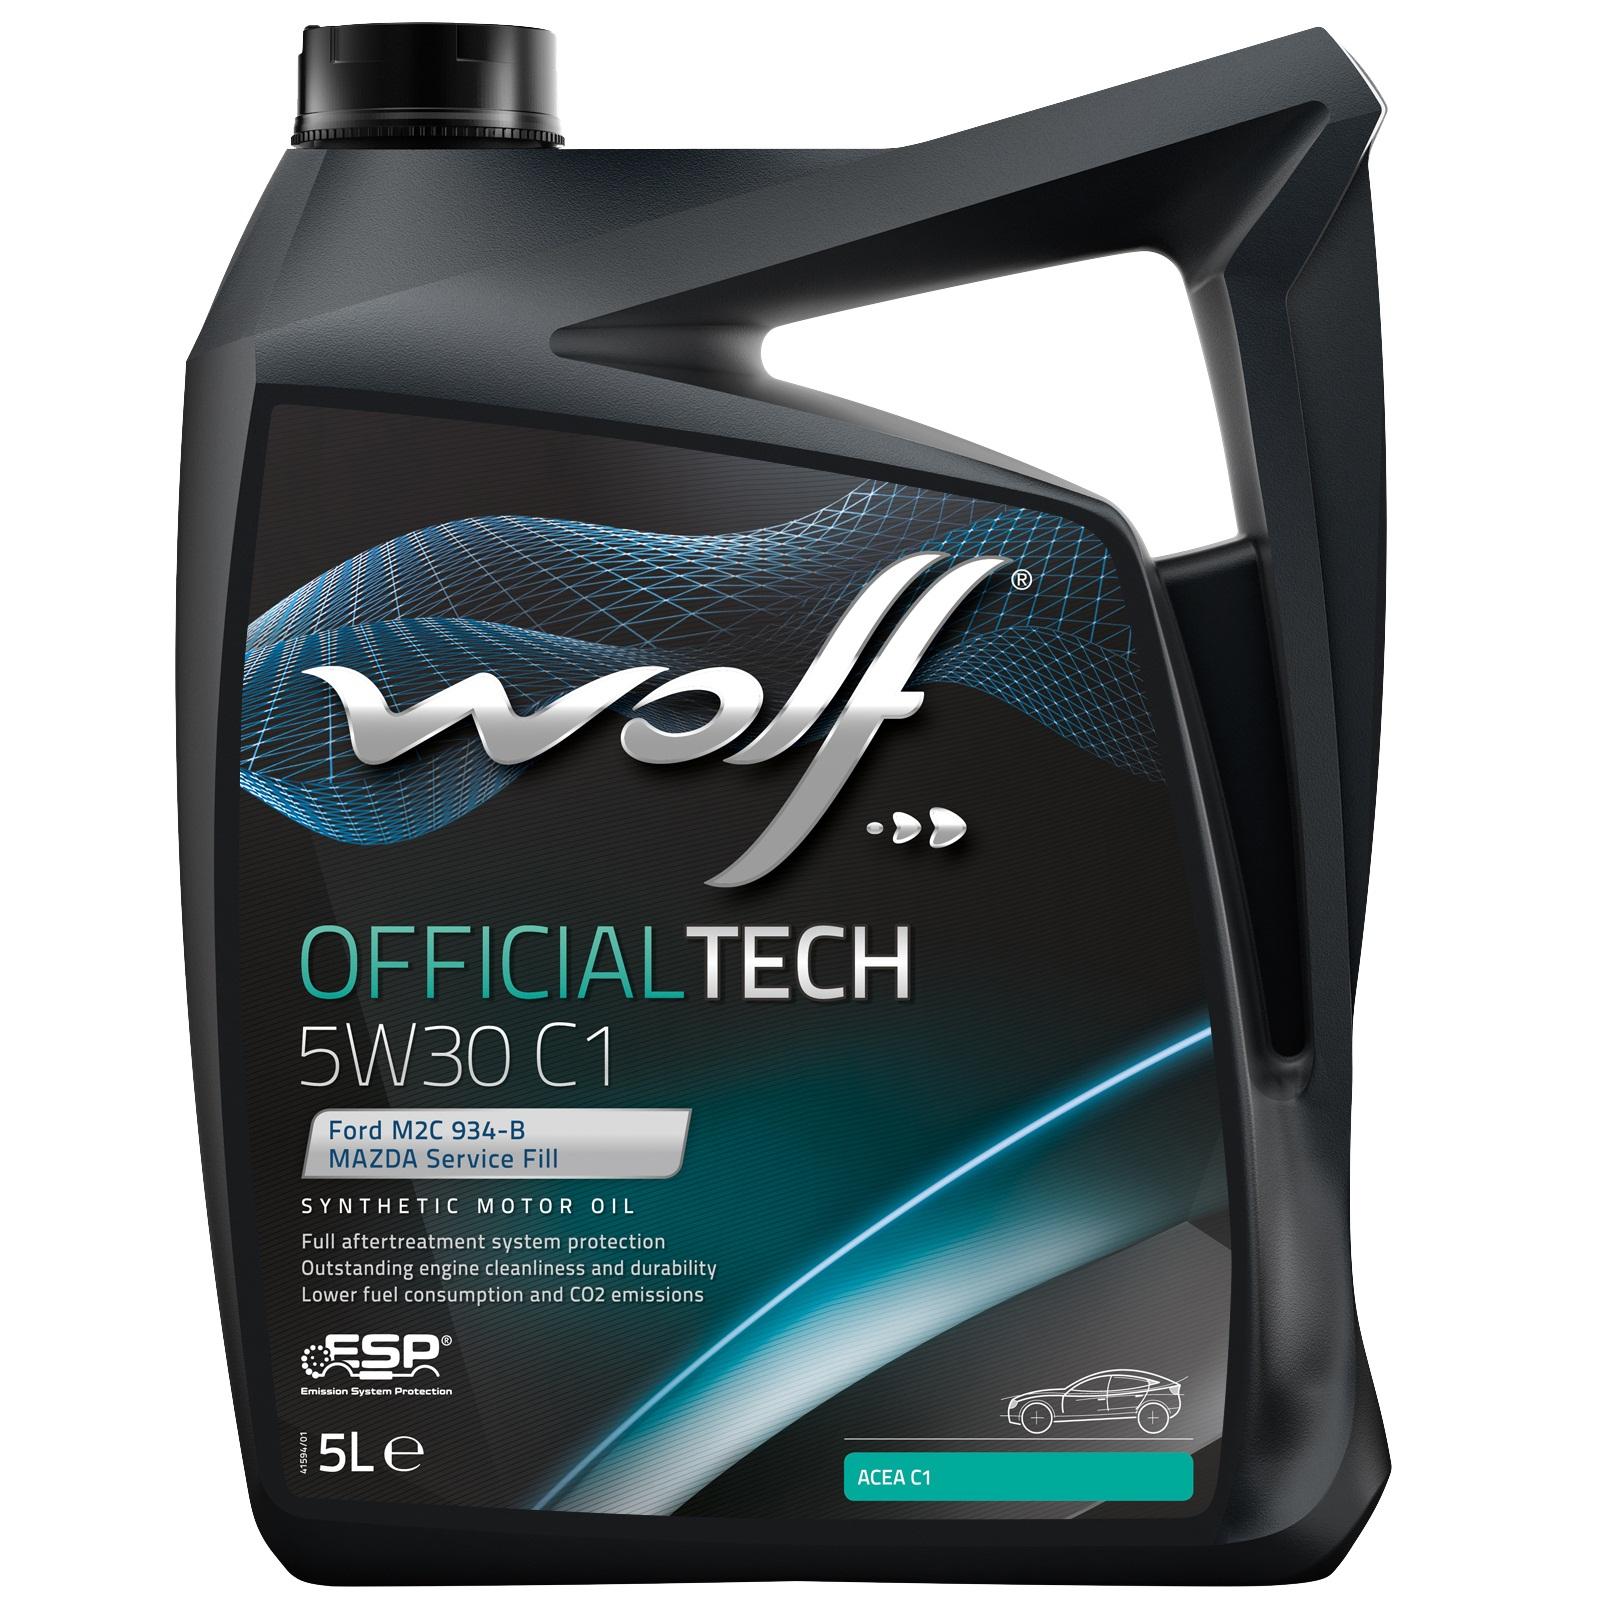 ULEI MOTOR WOLF OFFICIALTECH C1 5W30 5L